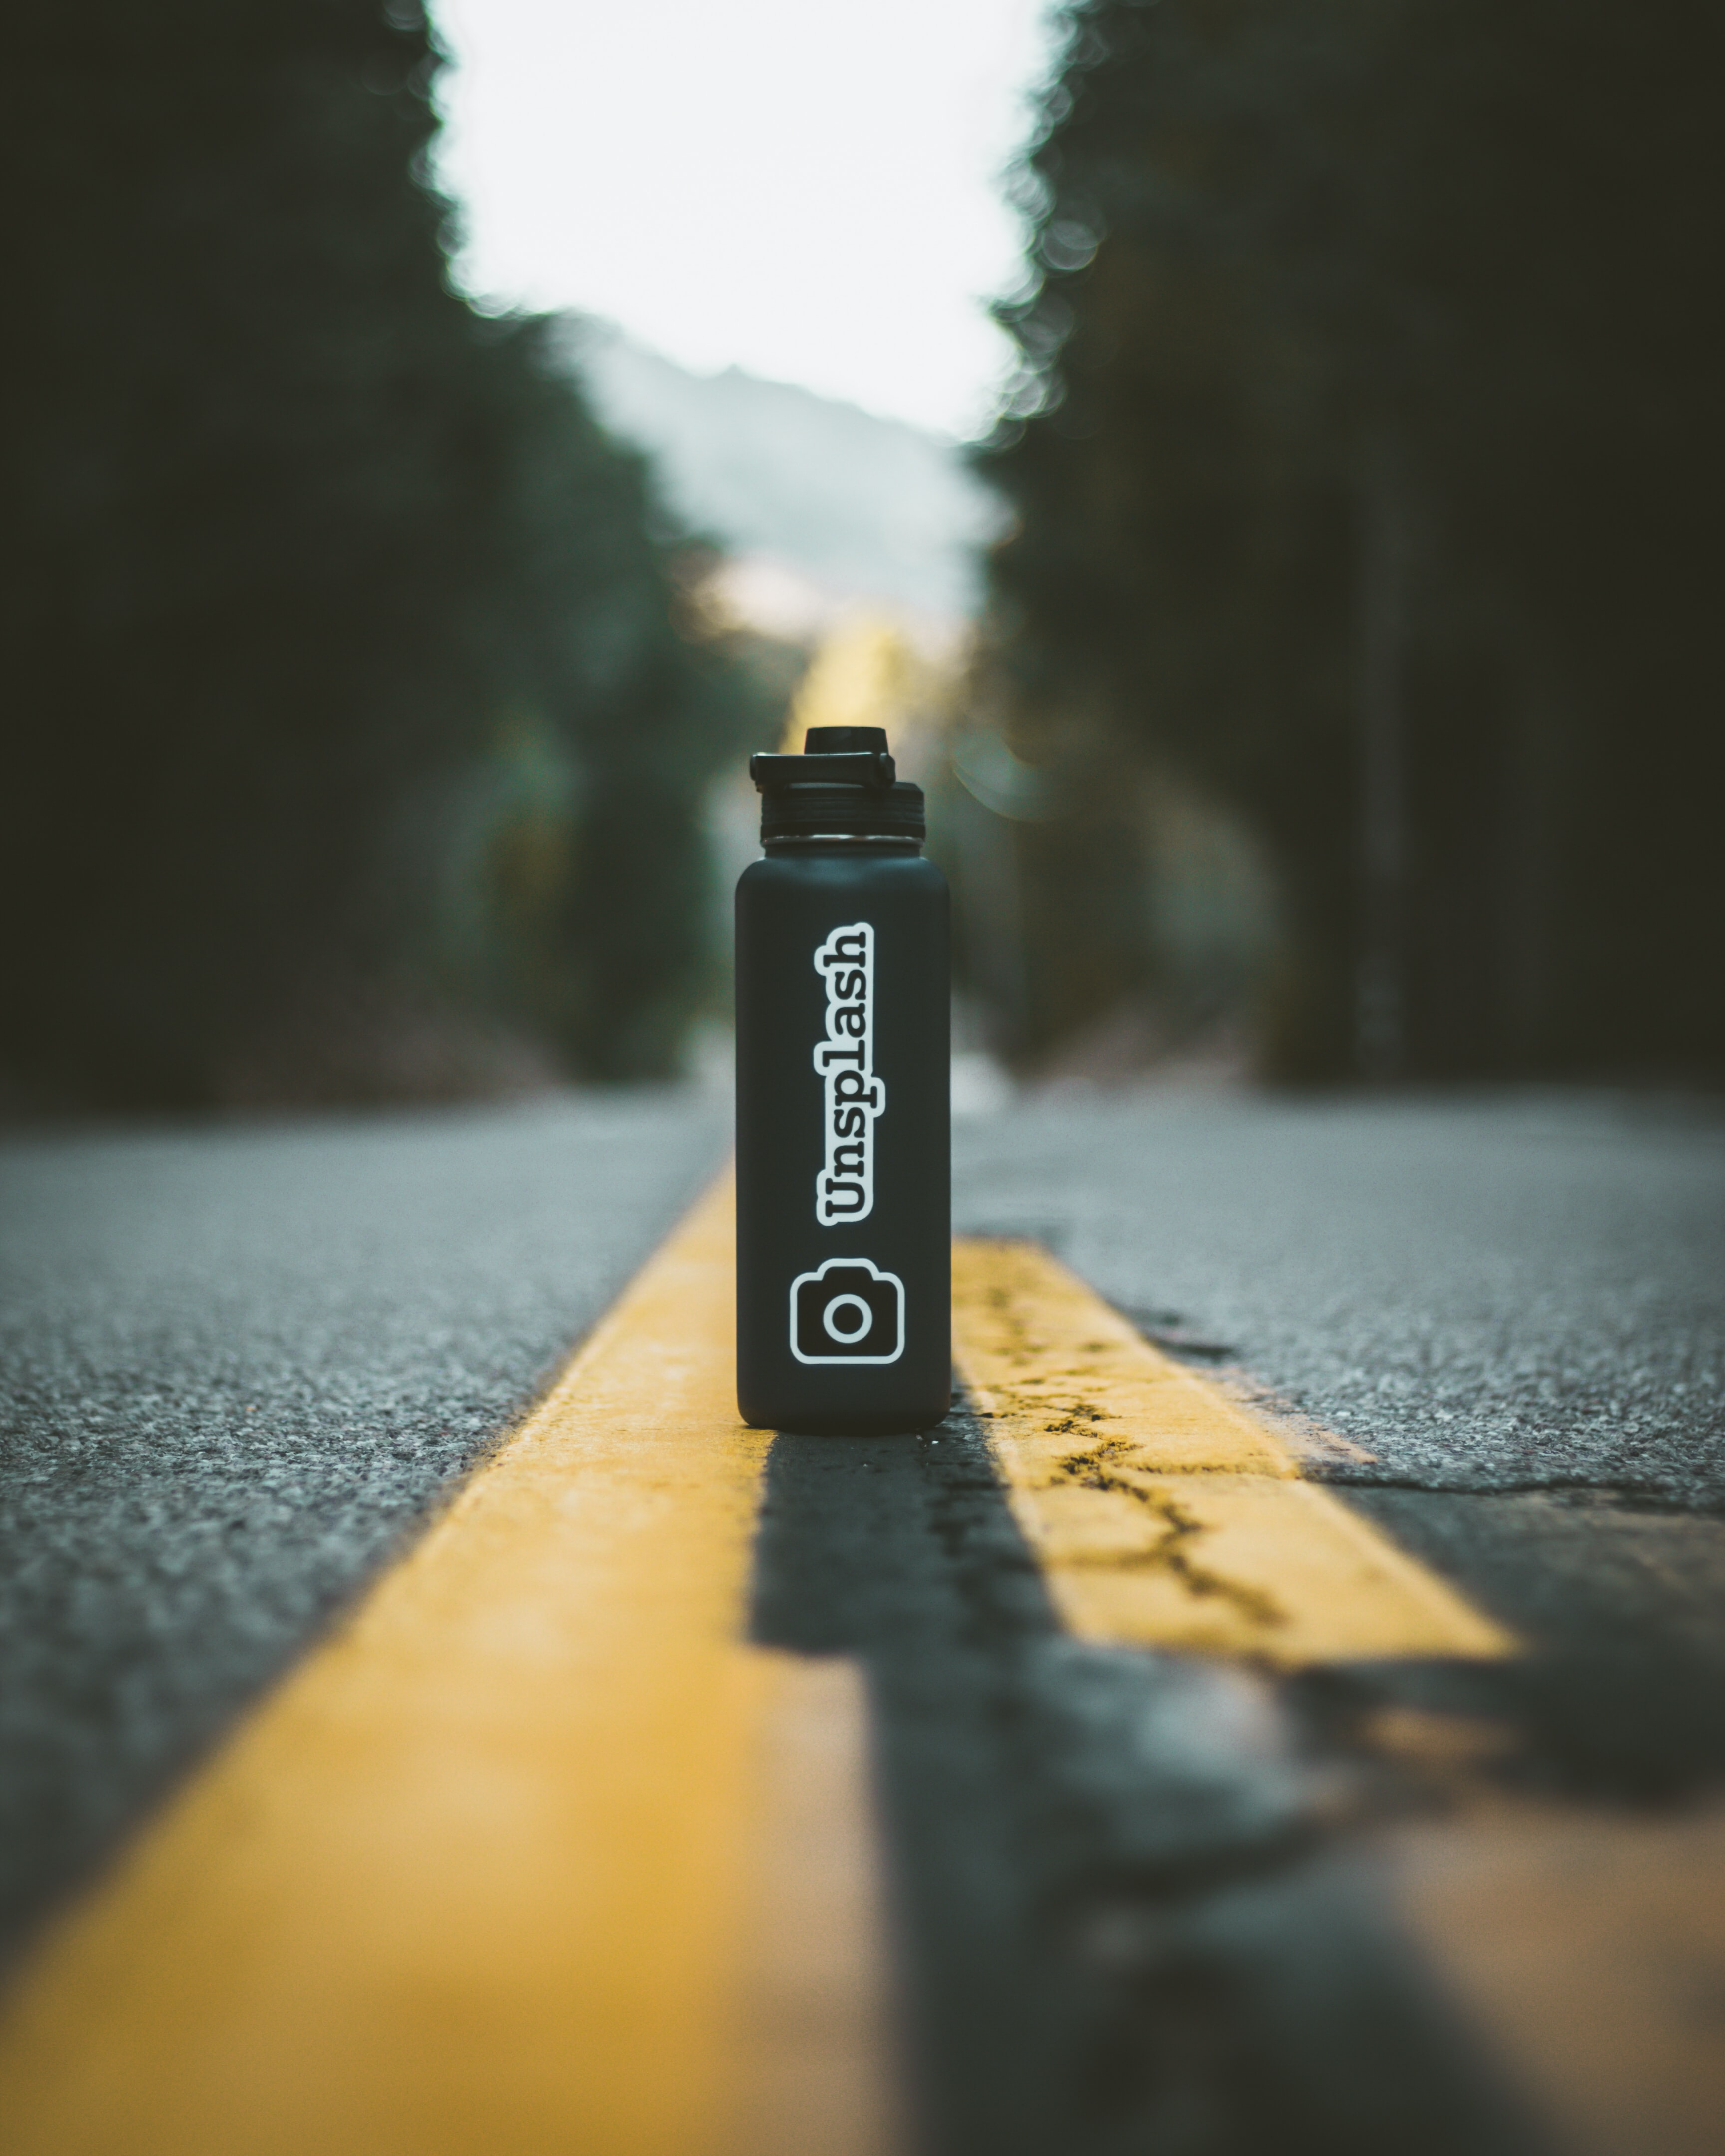 tilt-shift photography of Unsplash bottle